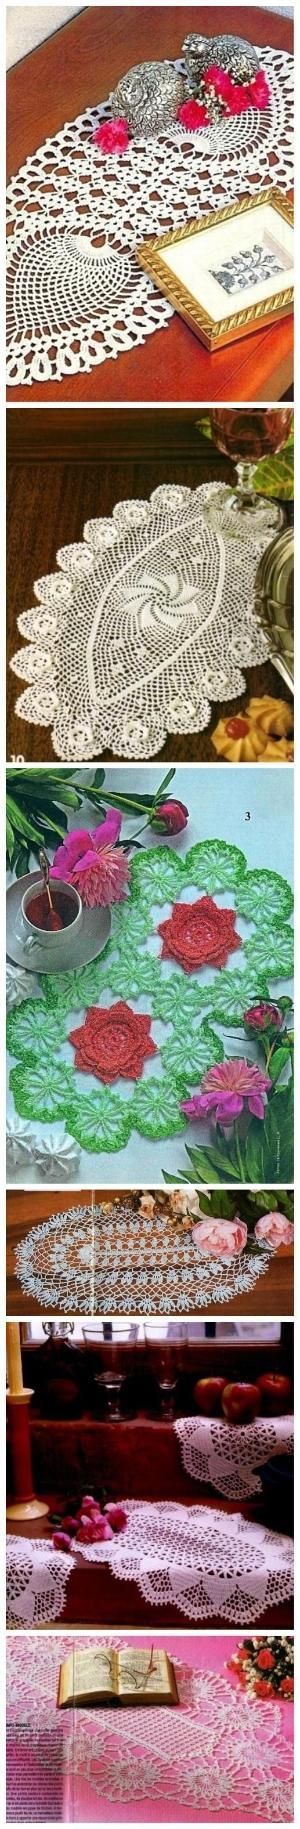 "Many free crochet doily chart, diagram patterns here. I used ""Google Translate"". by olyam.winshstr"